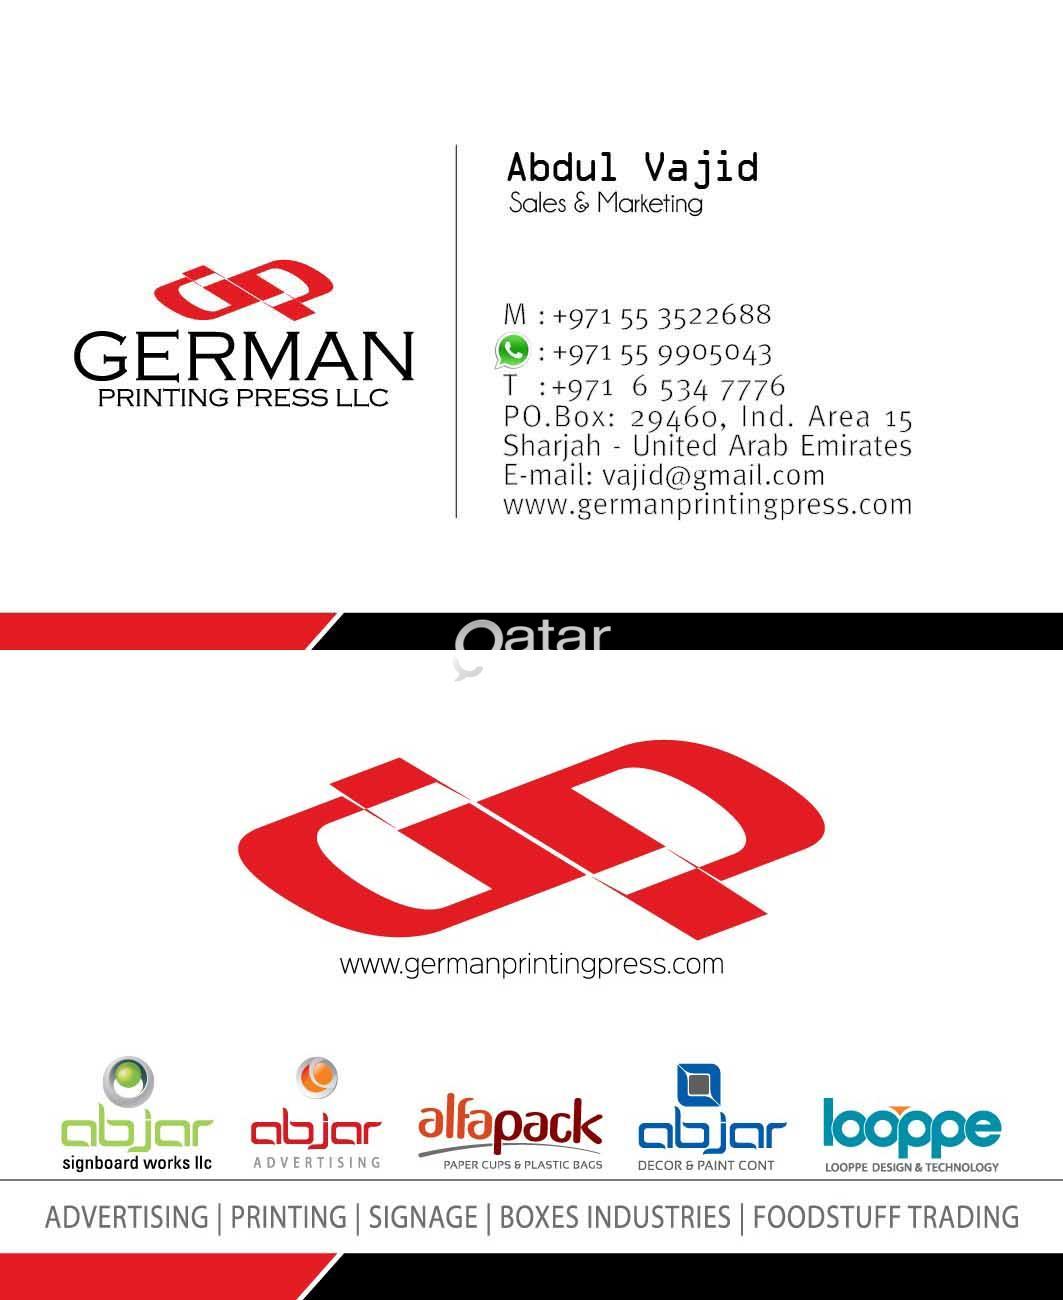 printing services attractive price from Dubai & Qatar